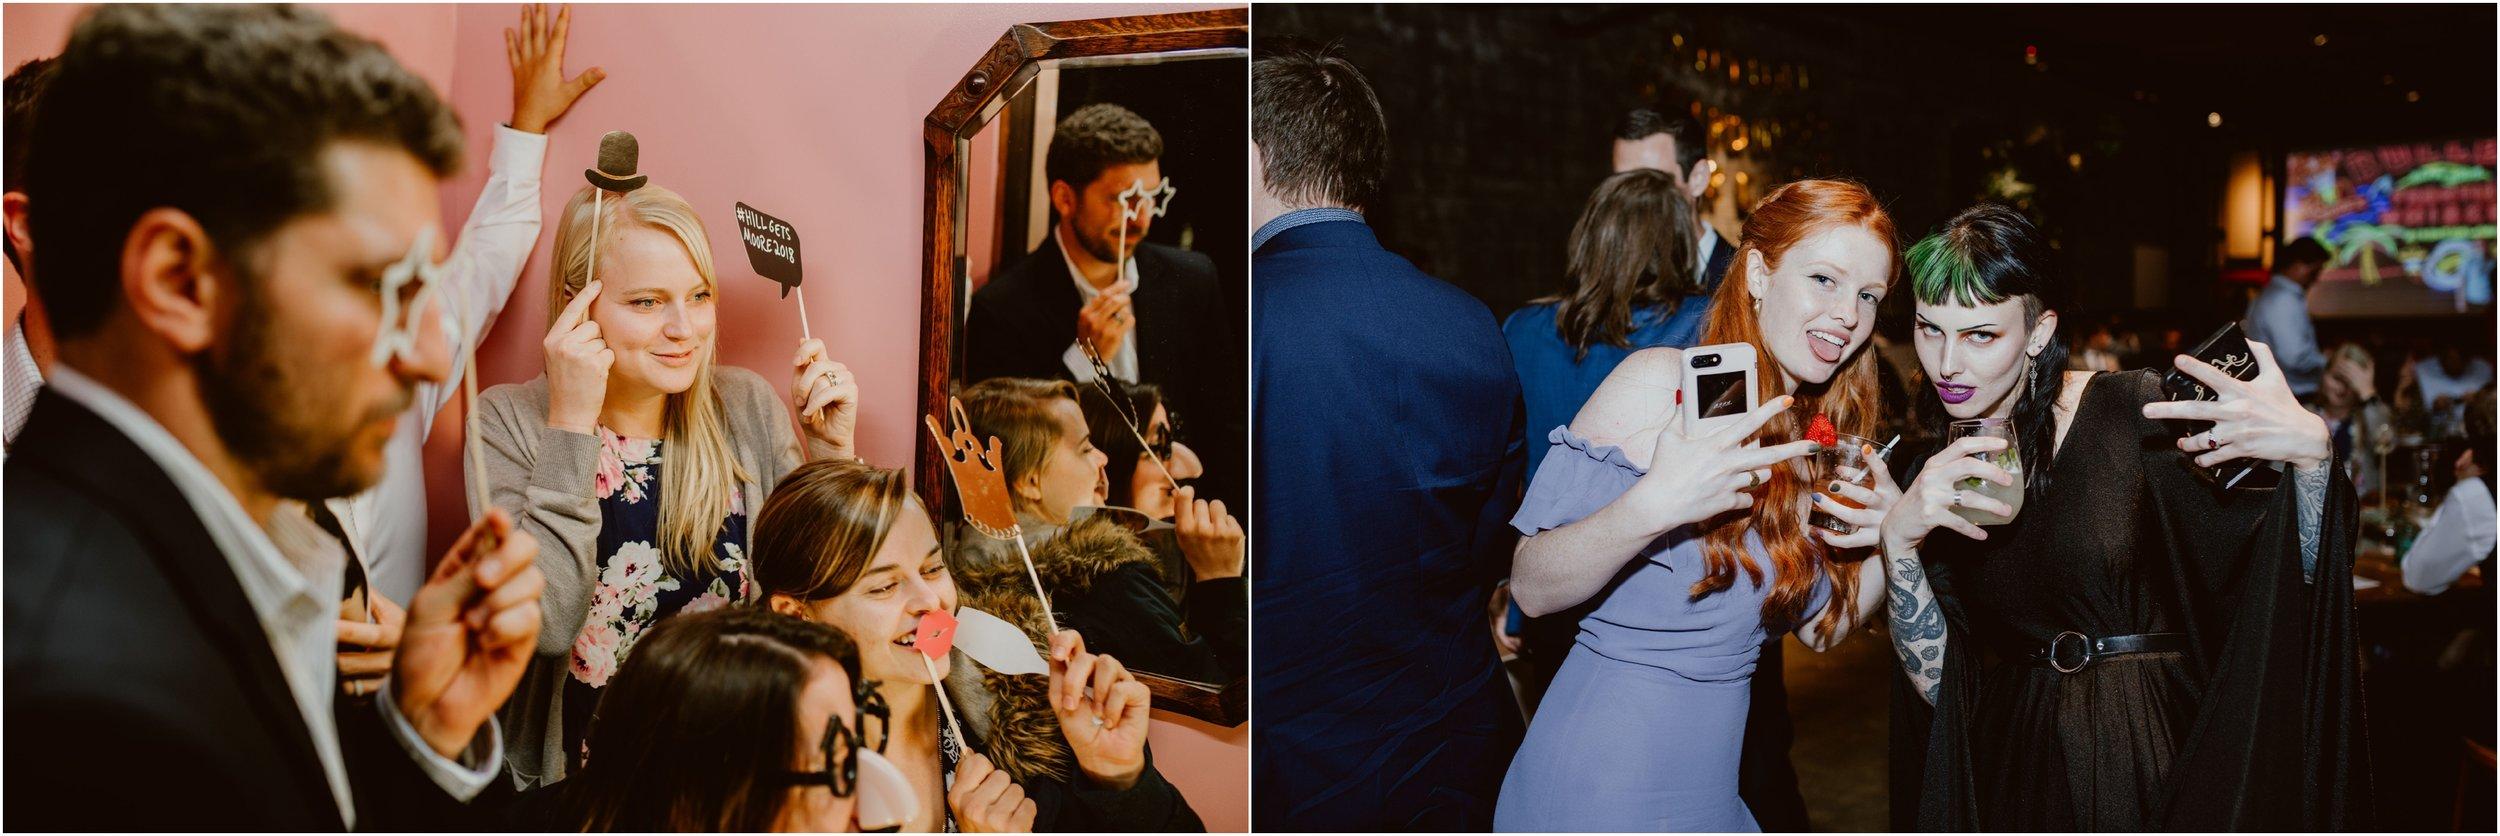 Smogshoppe-Wedding-S+C-Diana-Lake-Photography-1094.jpg